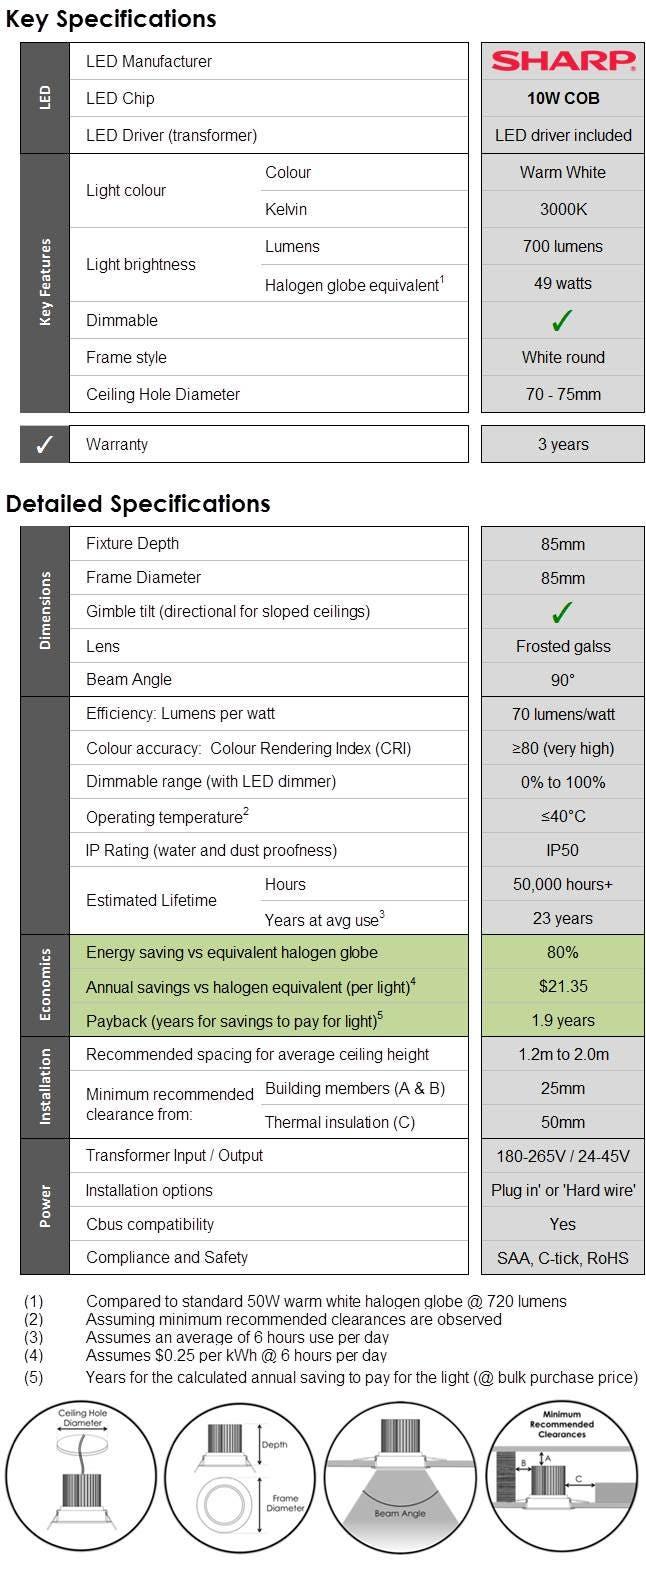 High efficiency Sharp LED down-light